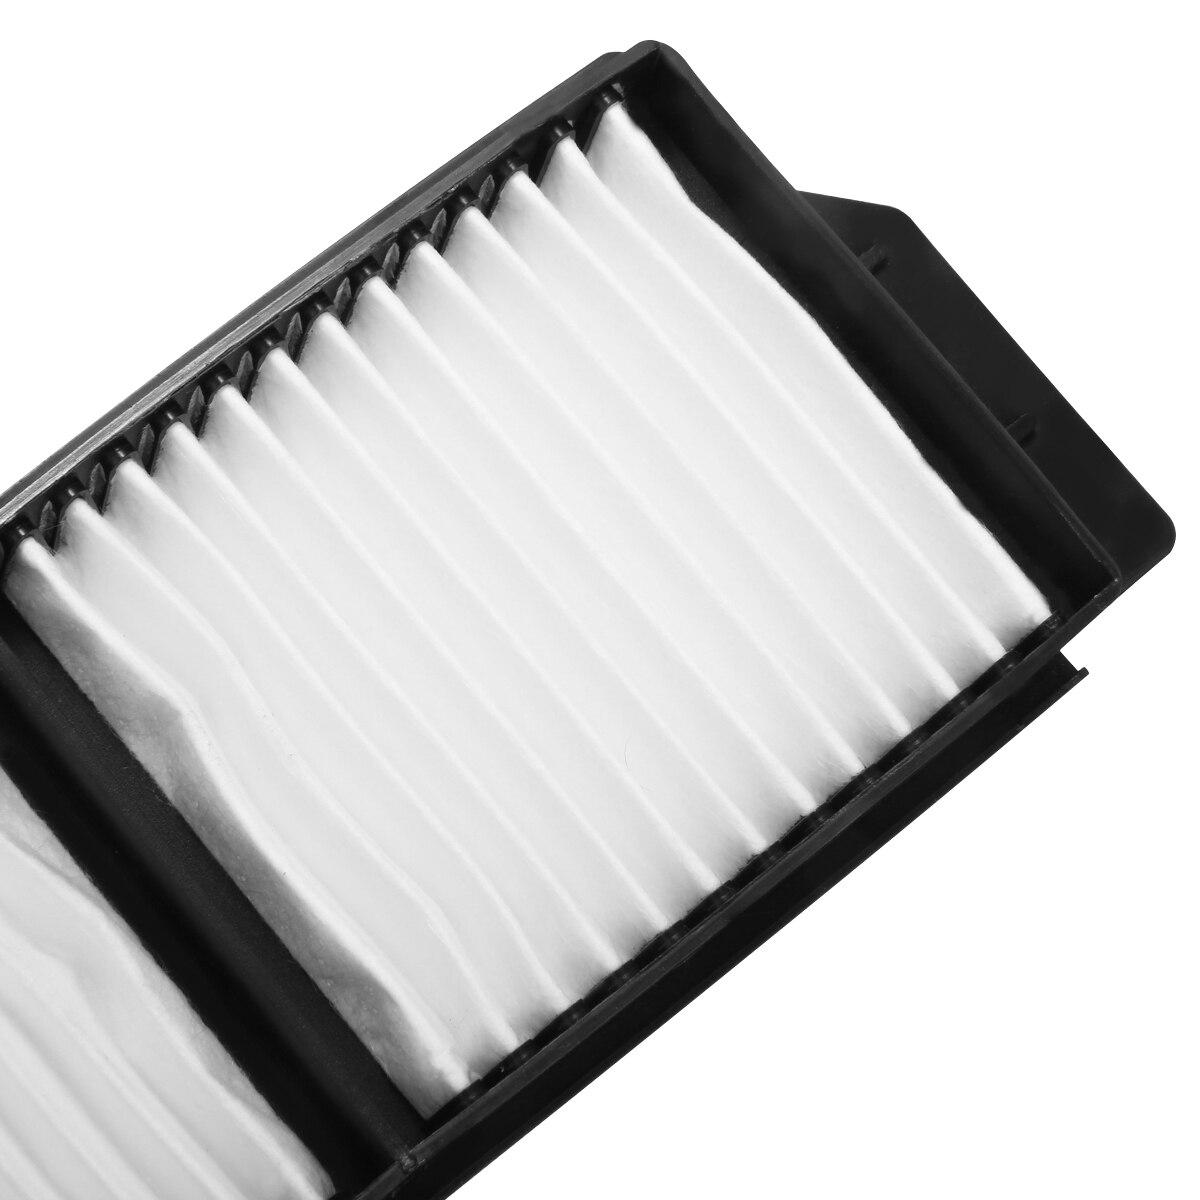 Automobiles Filters Set 2pcs White Cabin Air Filter For Mazda 3 Mazda 5 OEM:BP4K-61-J6X